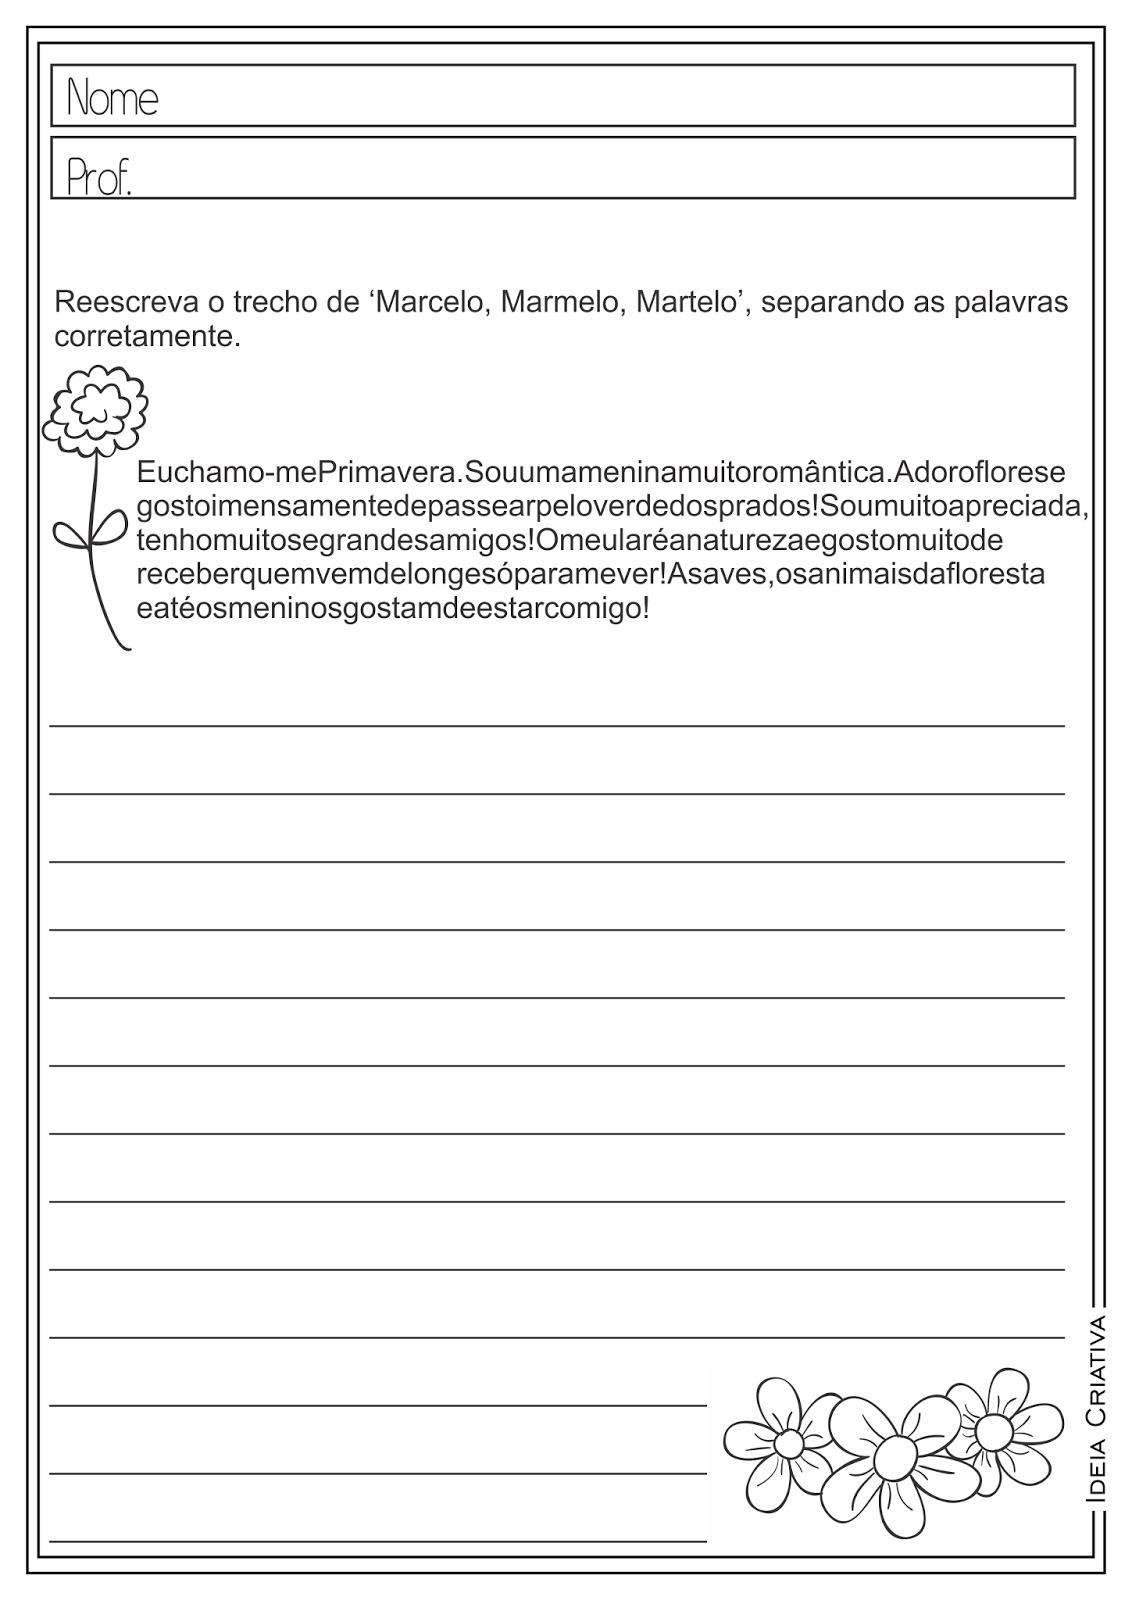 Atividades Educativas Texto Aglutinado Língua Portuguesa para Ensino Fundamental